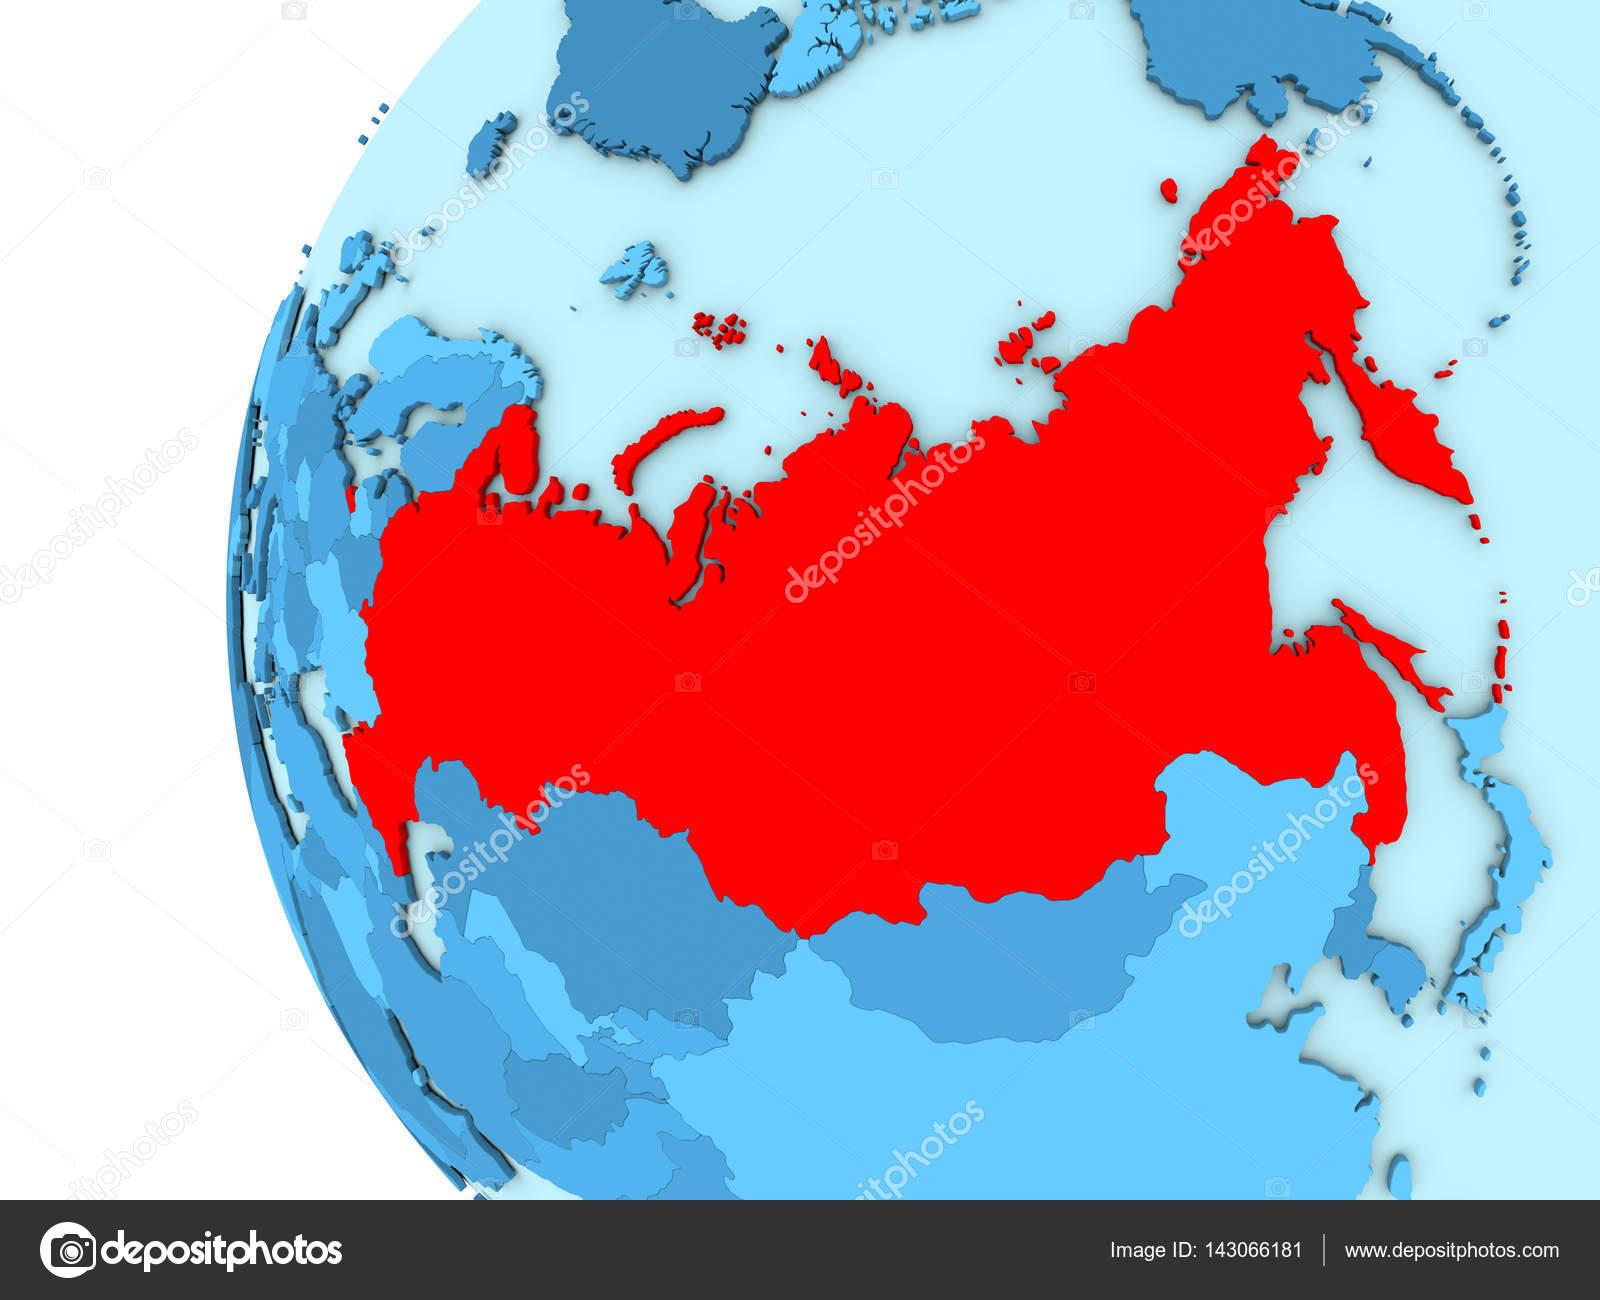 Rusia en globo azul fotos de stock tomiger 143066181 rusia en globo azul fotos de stock gumiabroncs Choice Image